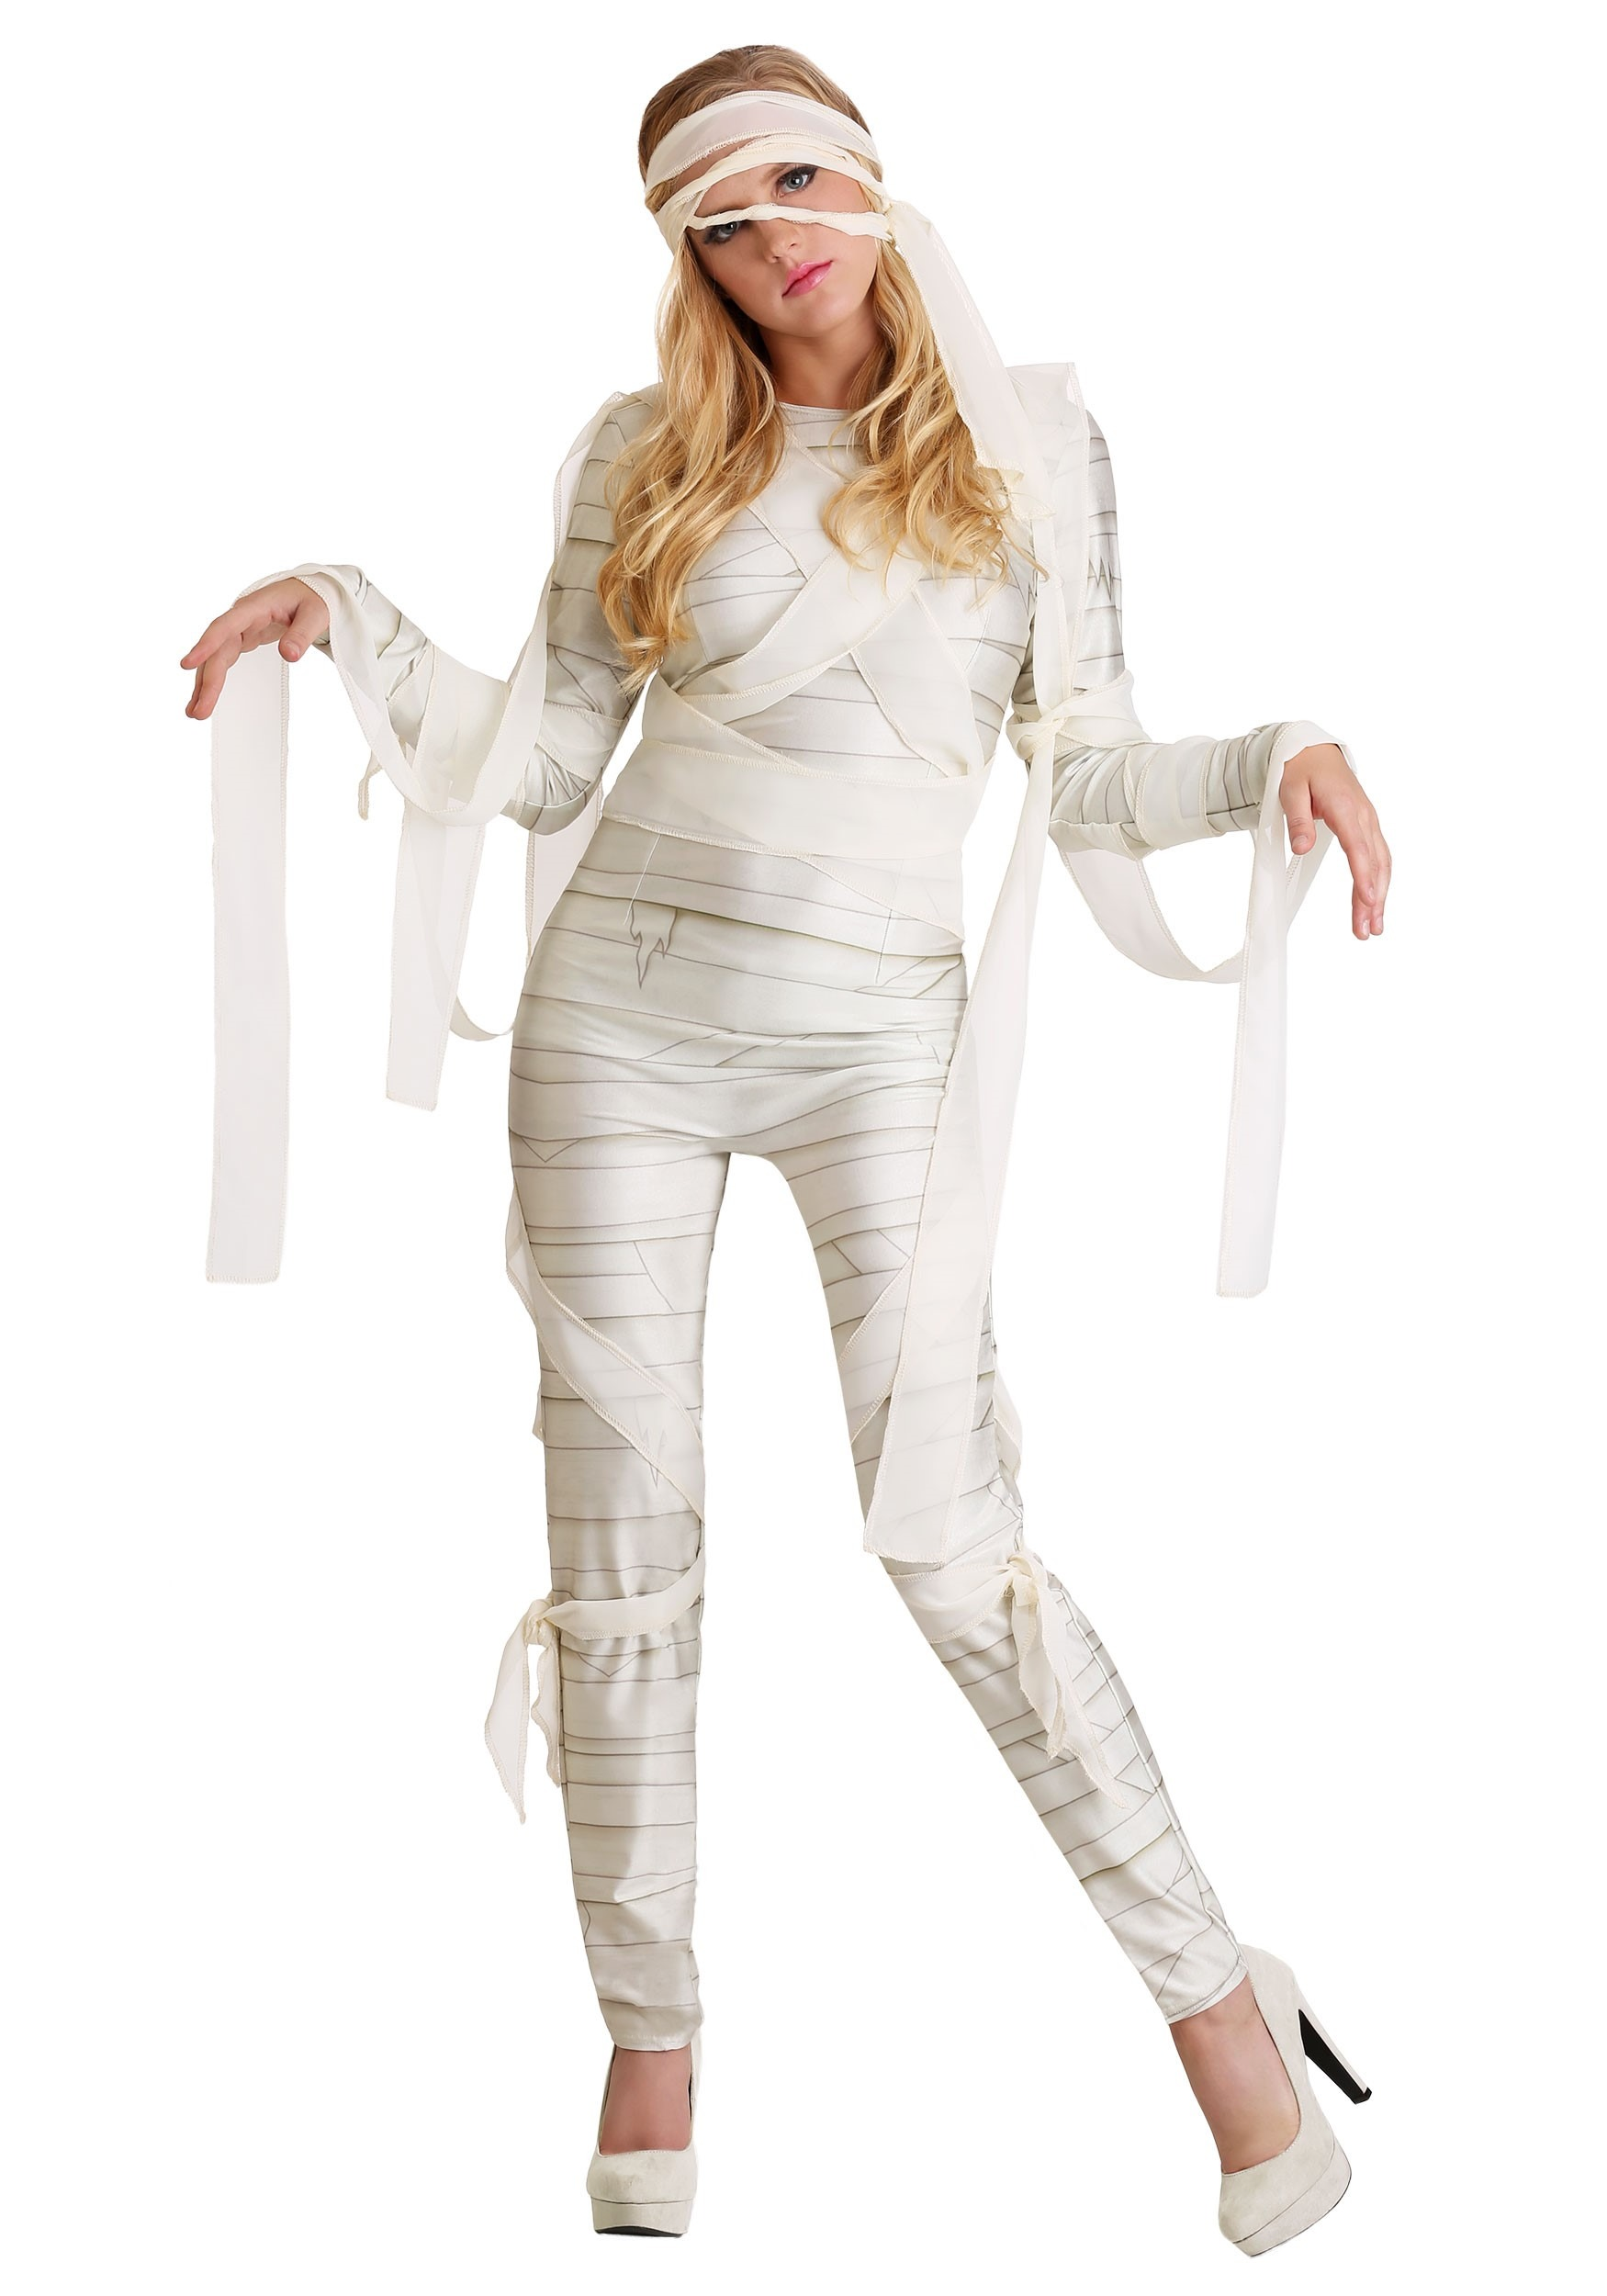 Under Wraps Mummy Costume for Women